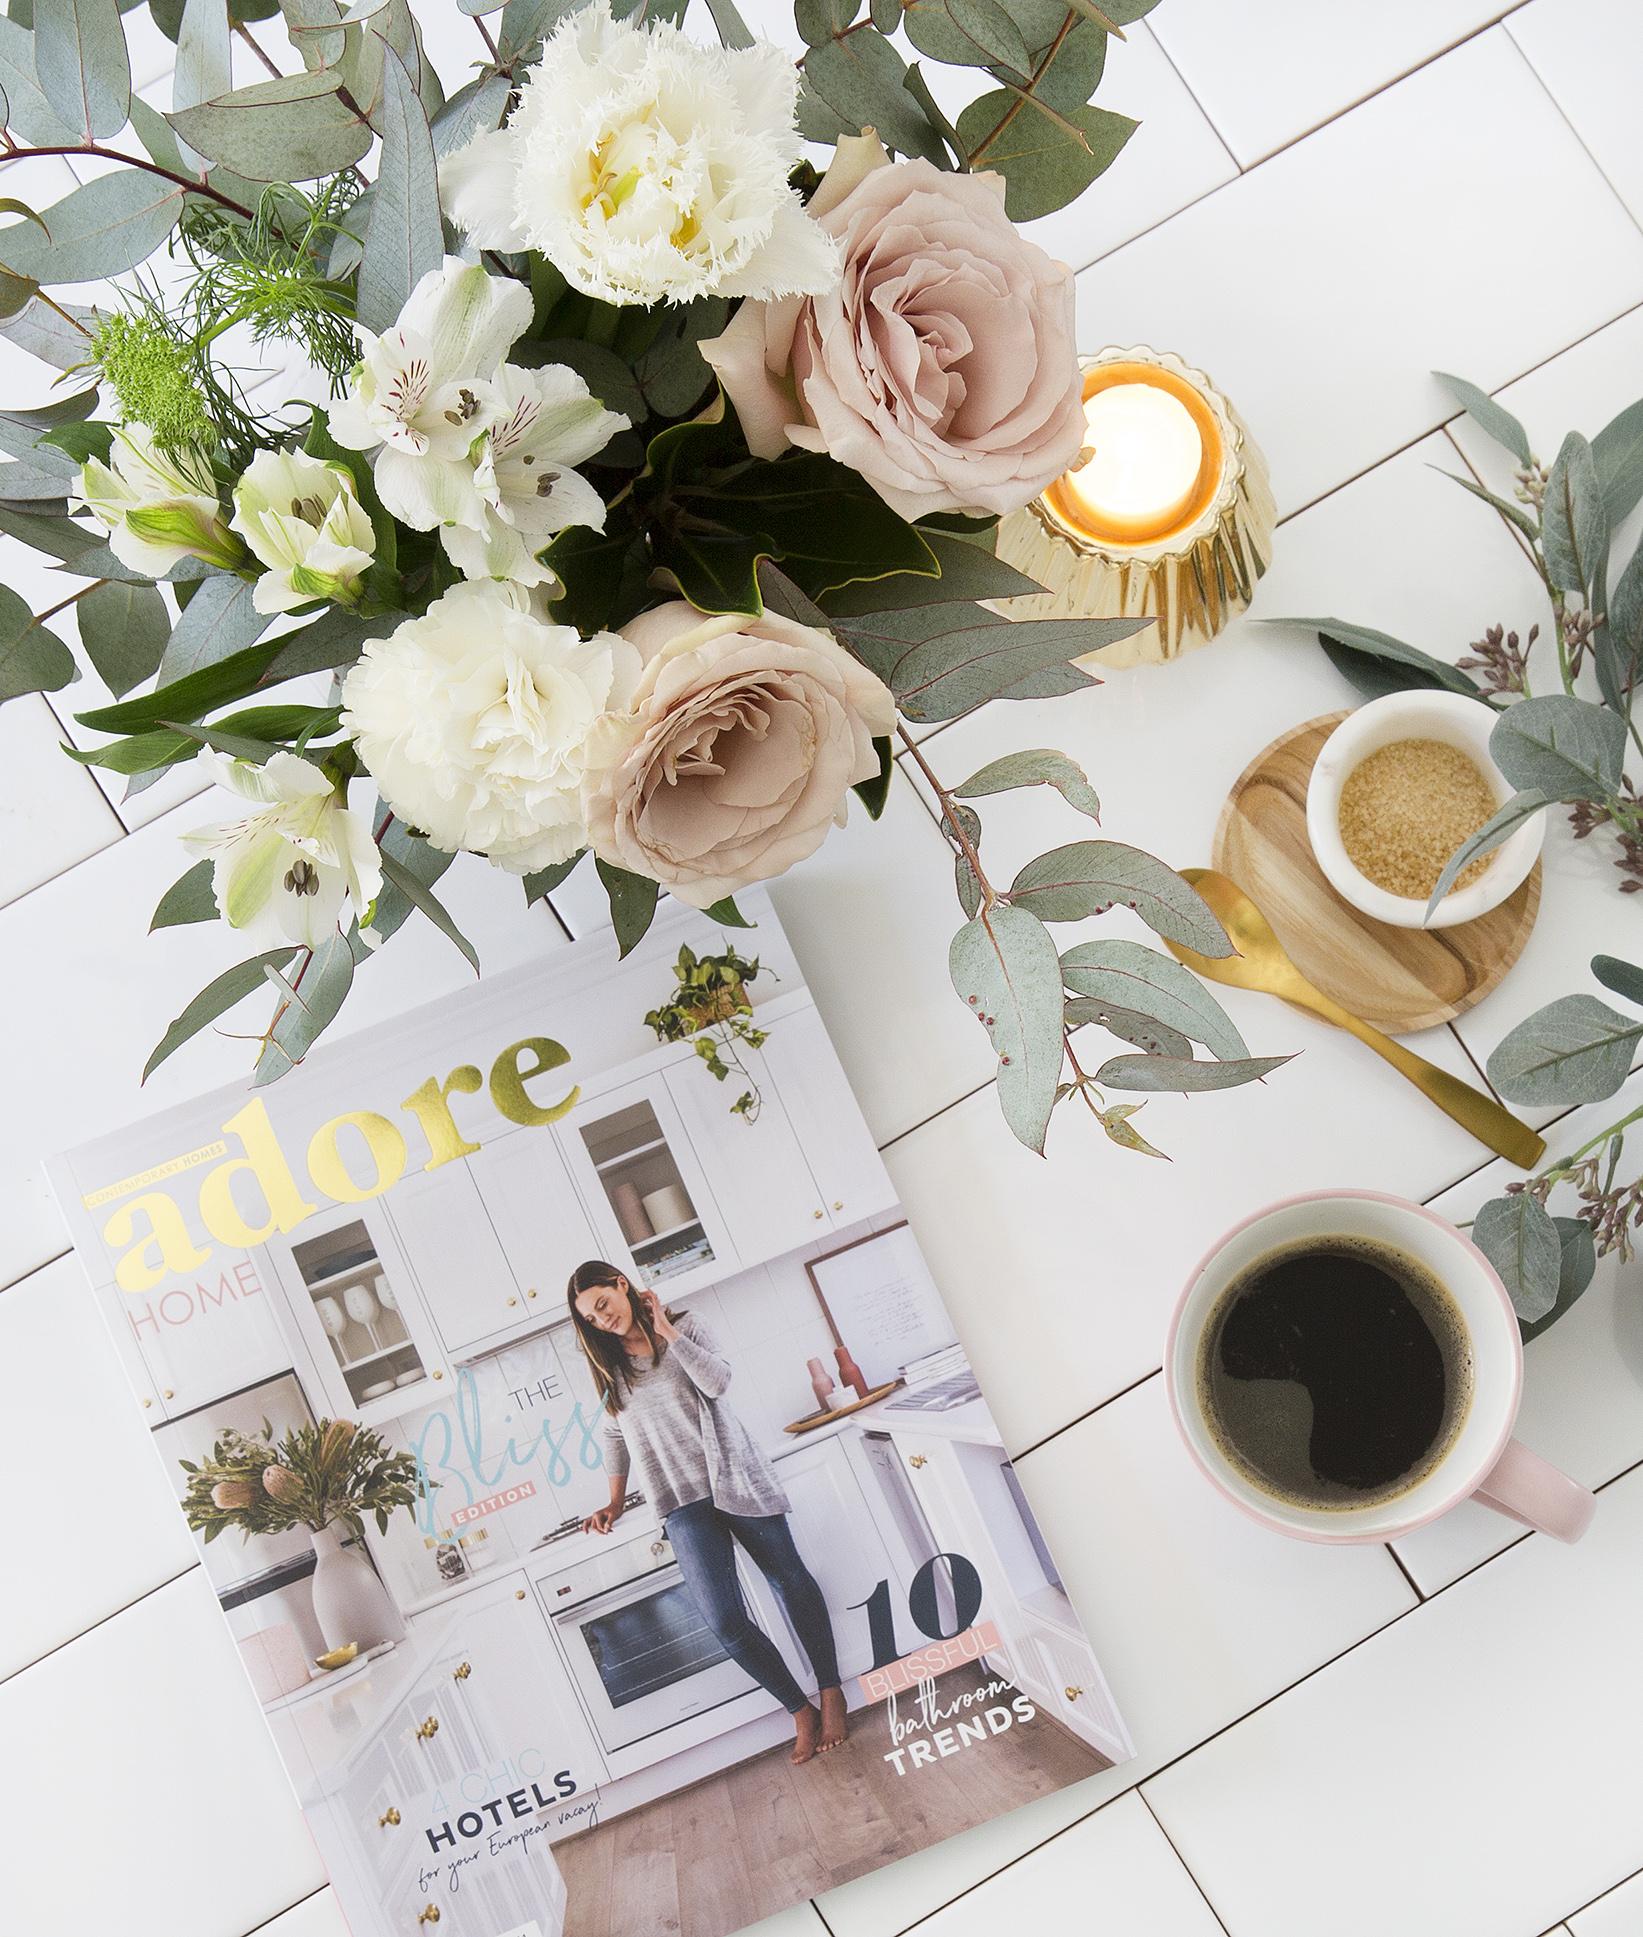 Bliss 1 adore_home_magazine_edition_spring.jpg